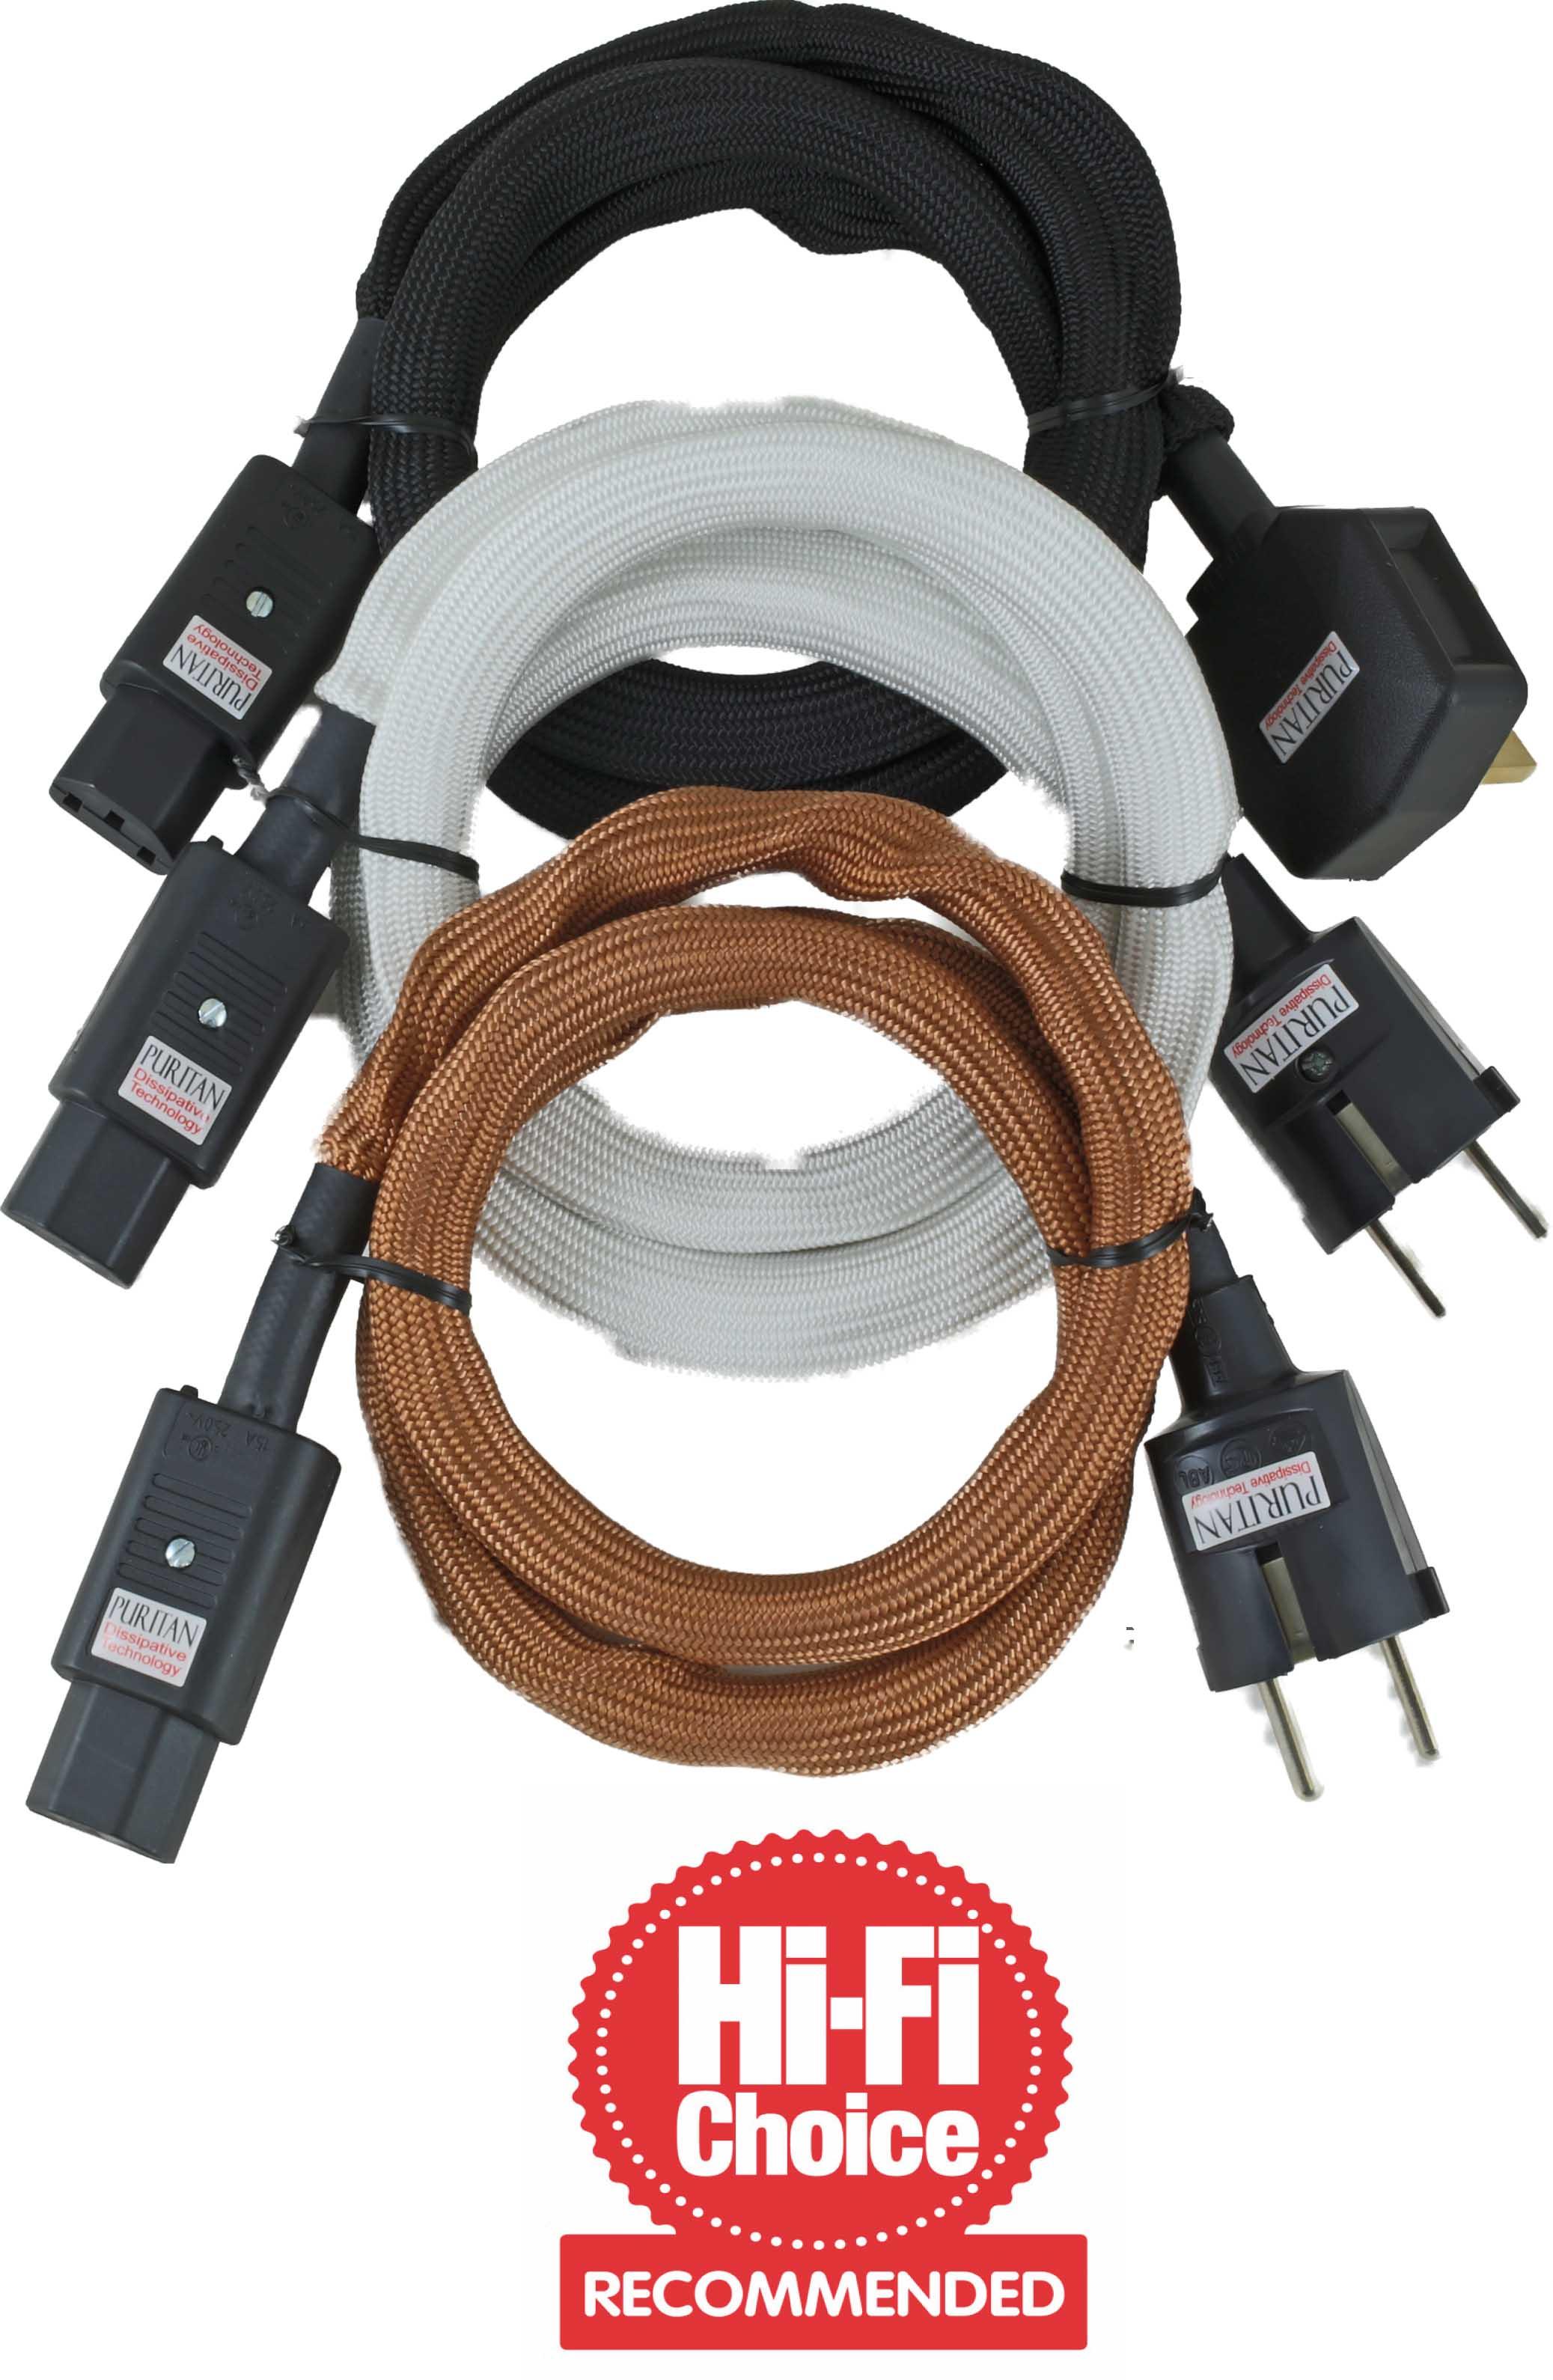 Mains Cables - Puritan Audio Laboratories